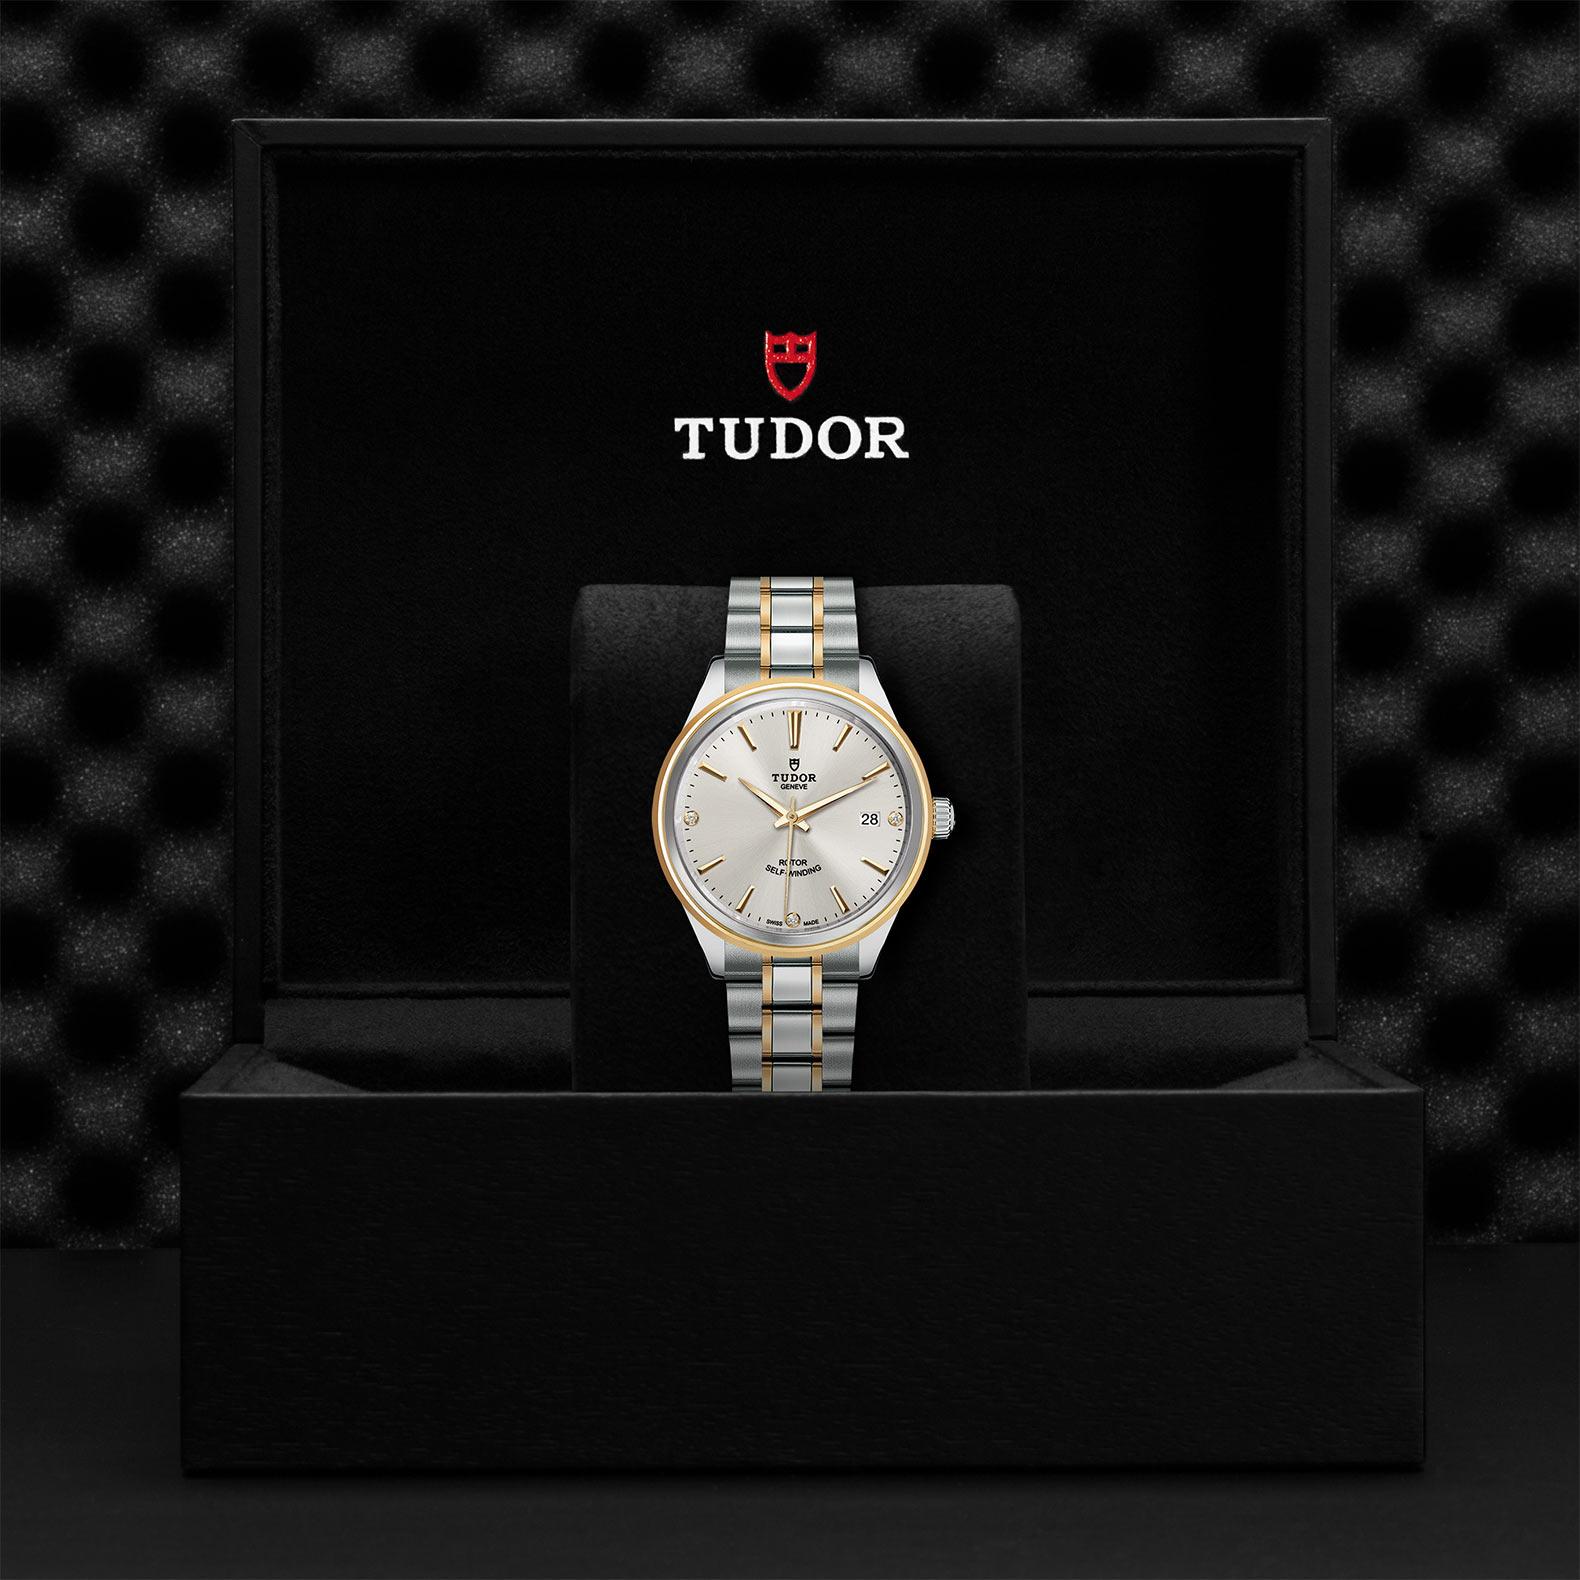 TUDOR Style M12503 0005 Presentationbox